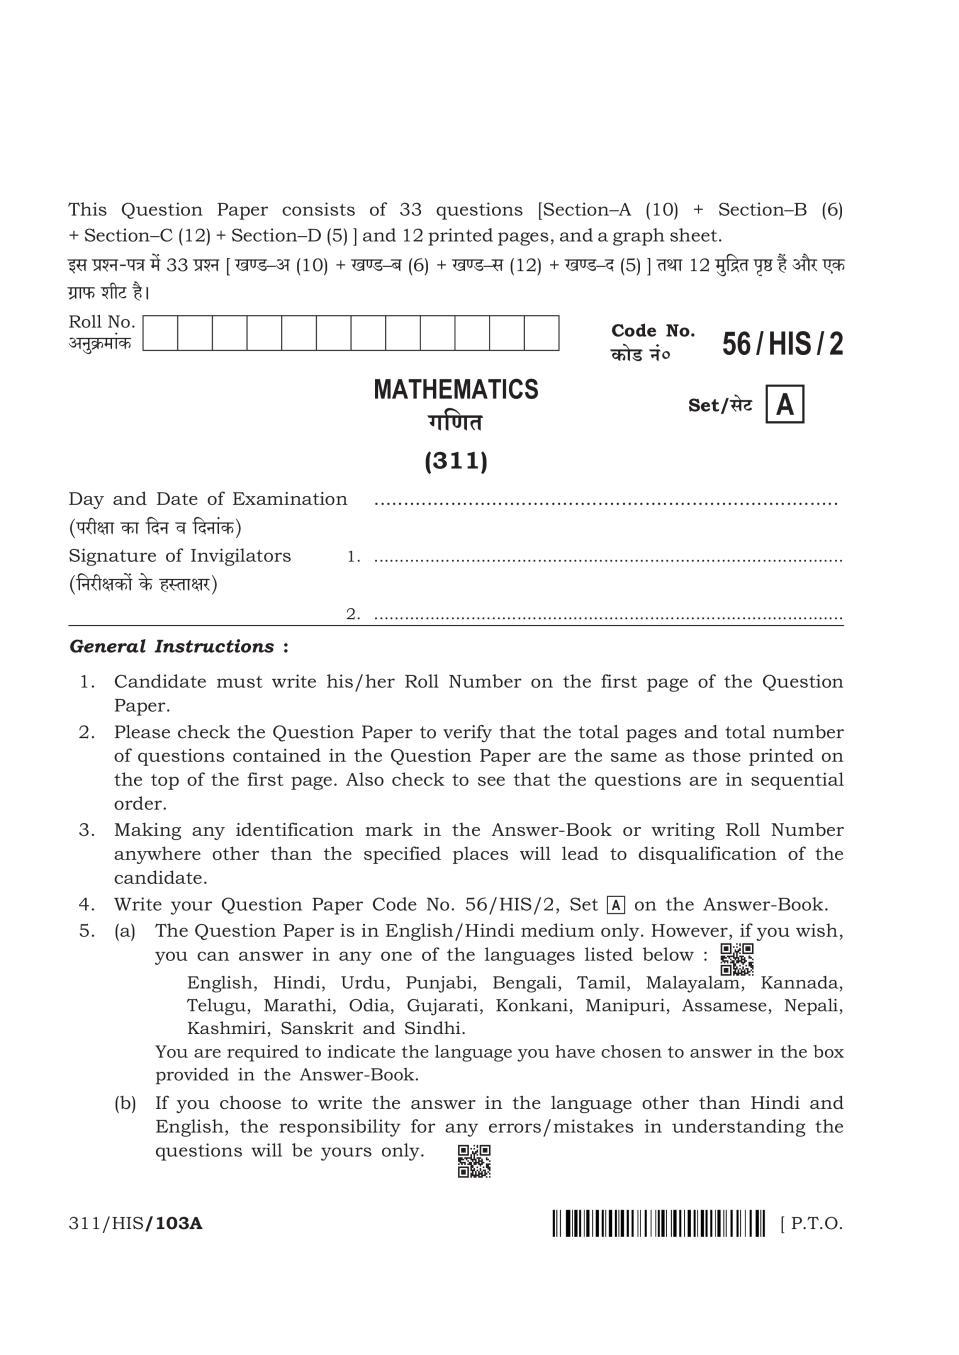 NIOS Class 12 Question Paper Apr 2018 - Mathematics - Page 1